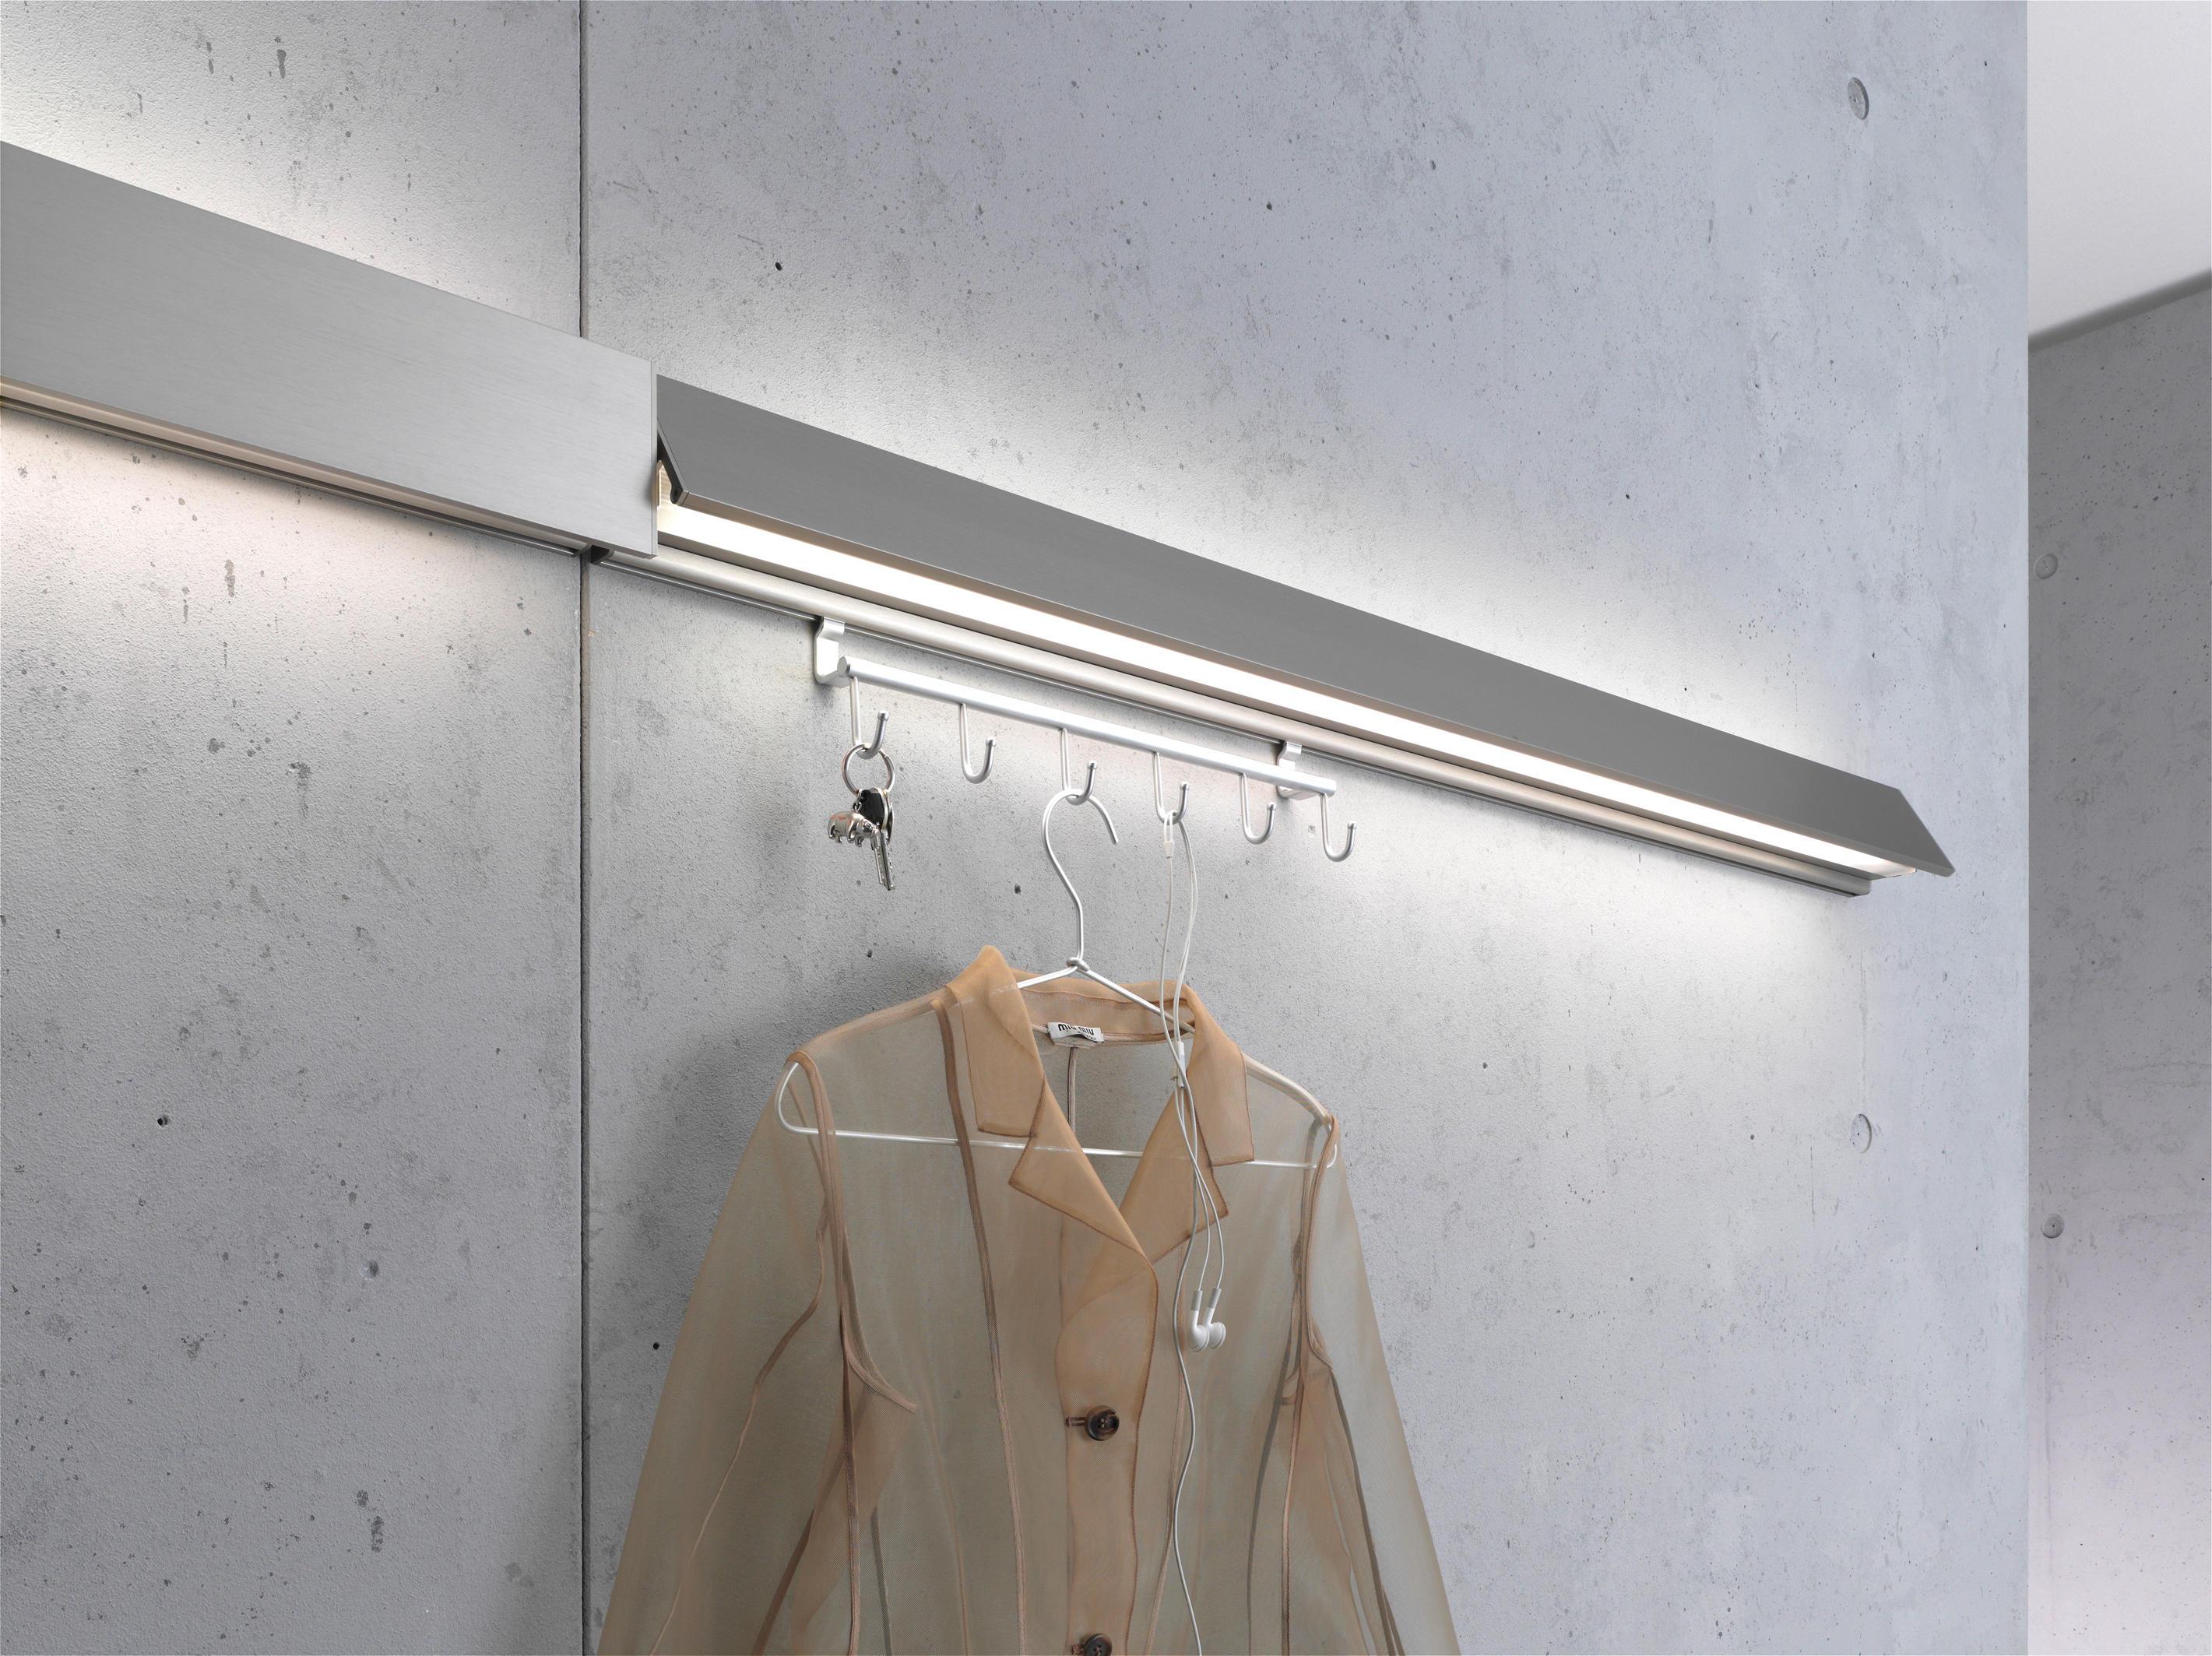 ... Coat rack light | GERA light system 8 by GERA | Wall lights & COAT RACK LIGHT | GERA LIGHT SYSTEM 8 - Wall lights from GERA ...